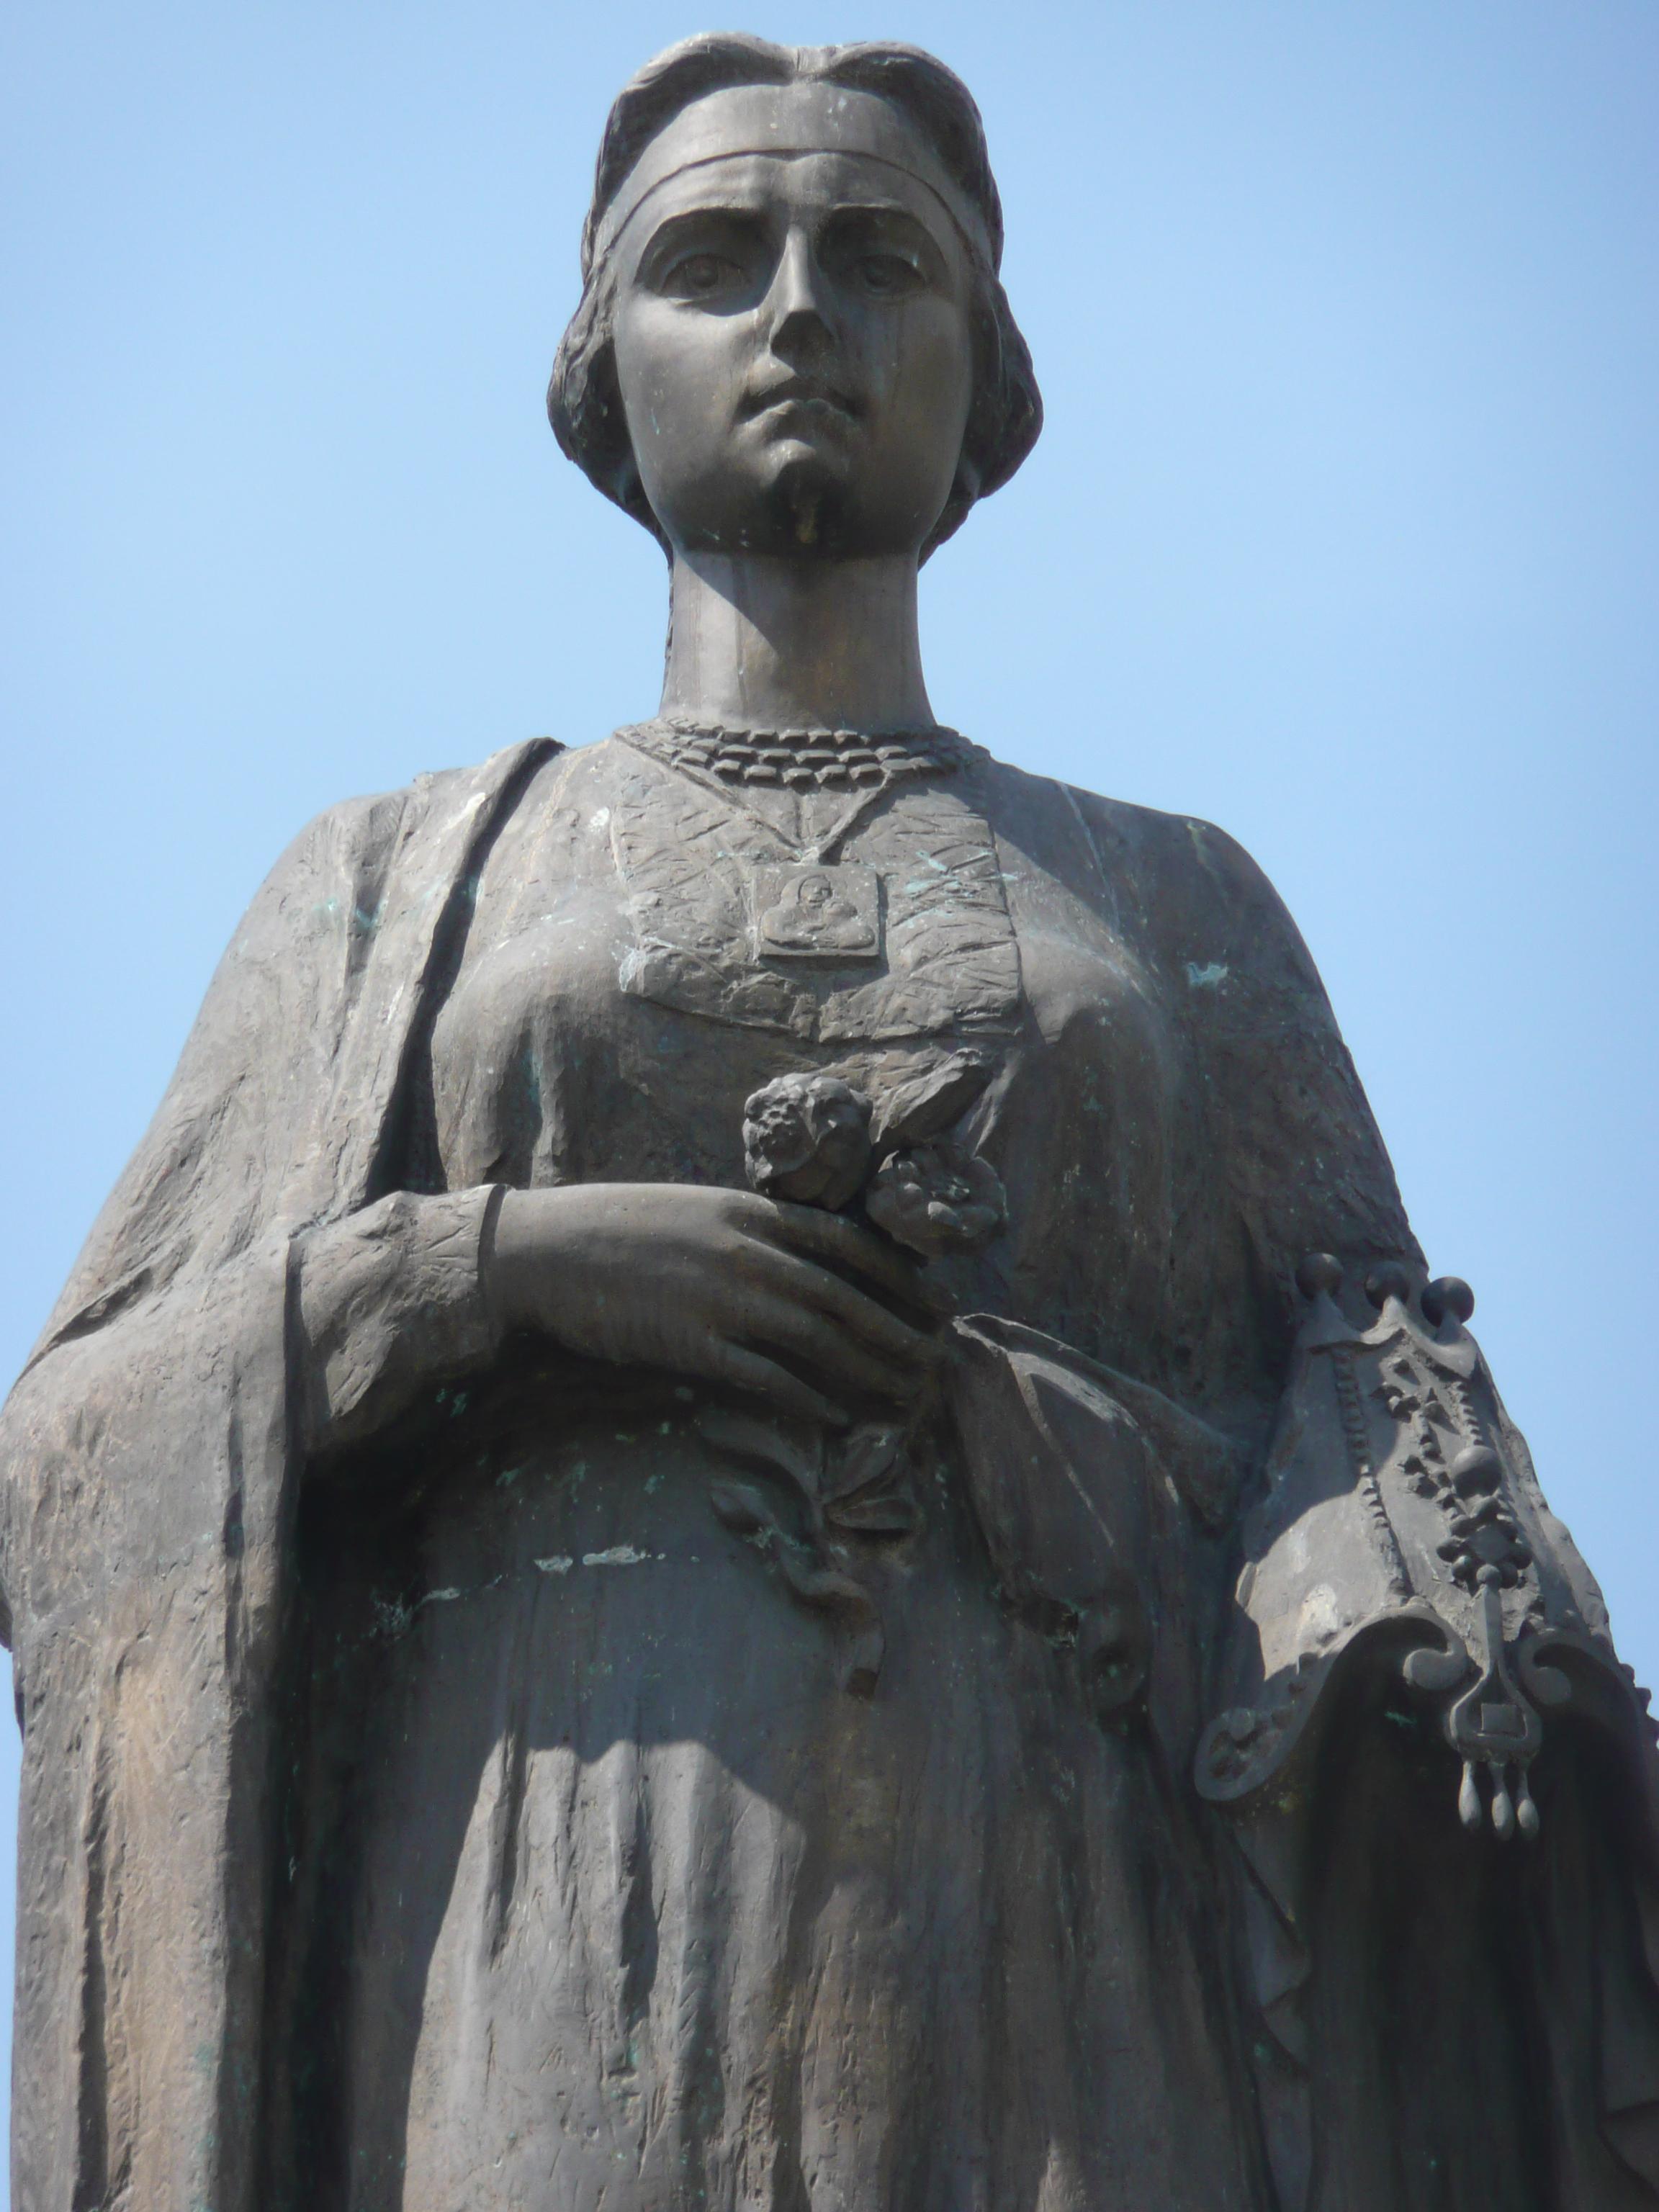 http://upload.wikimedia.org/wikipedia/commons/8/81/Roxelana_Rohatyn_Jul_2008151.JPG